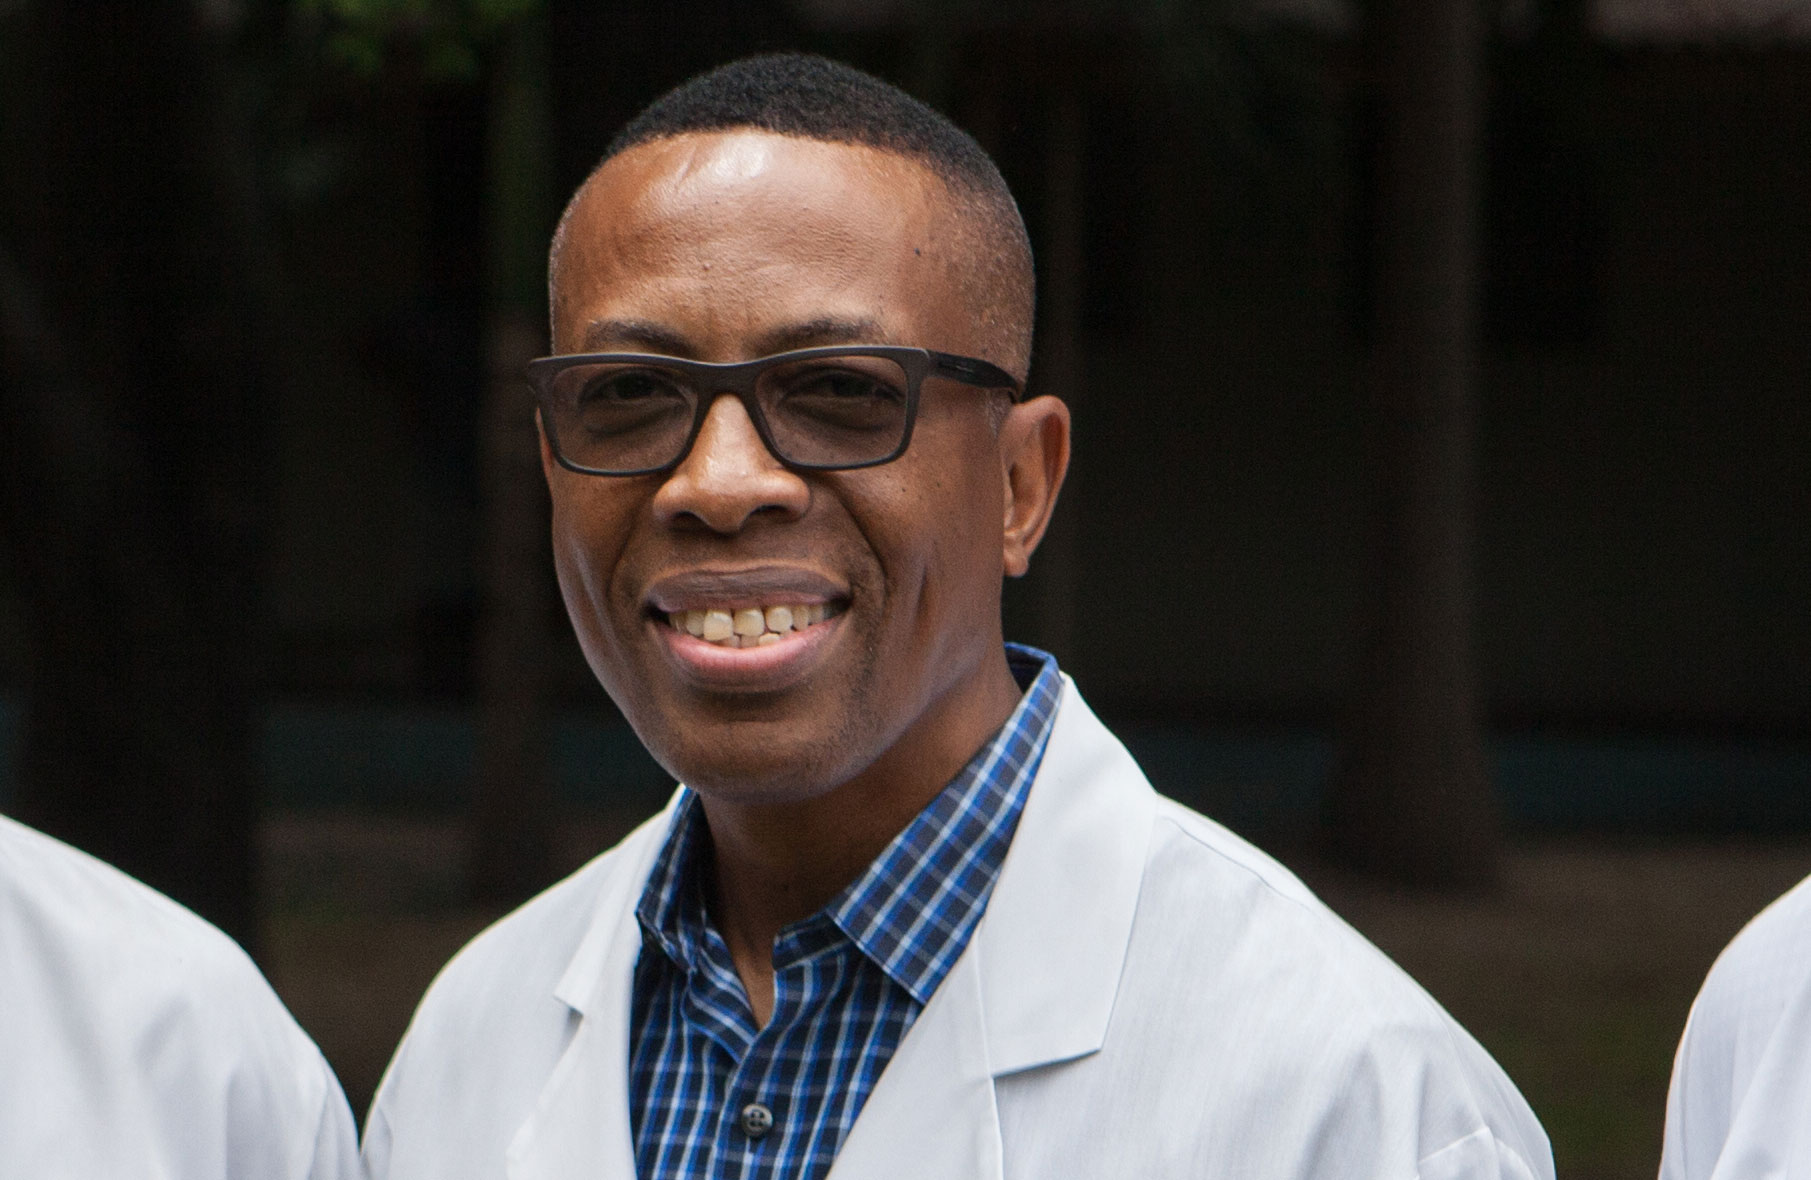 Dr. Patrice Joseph, MPH